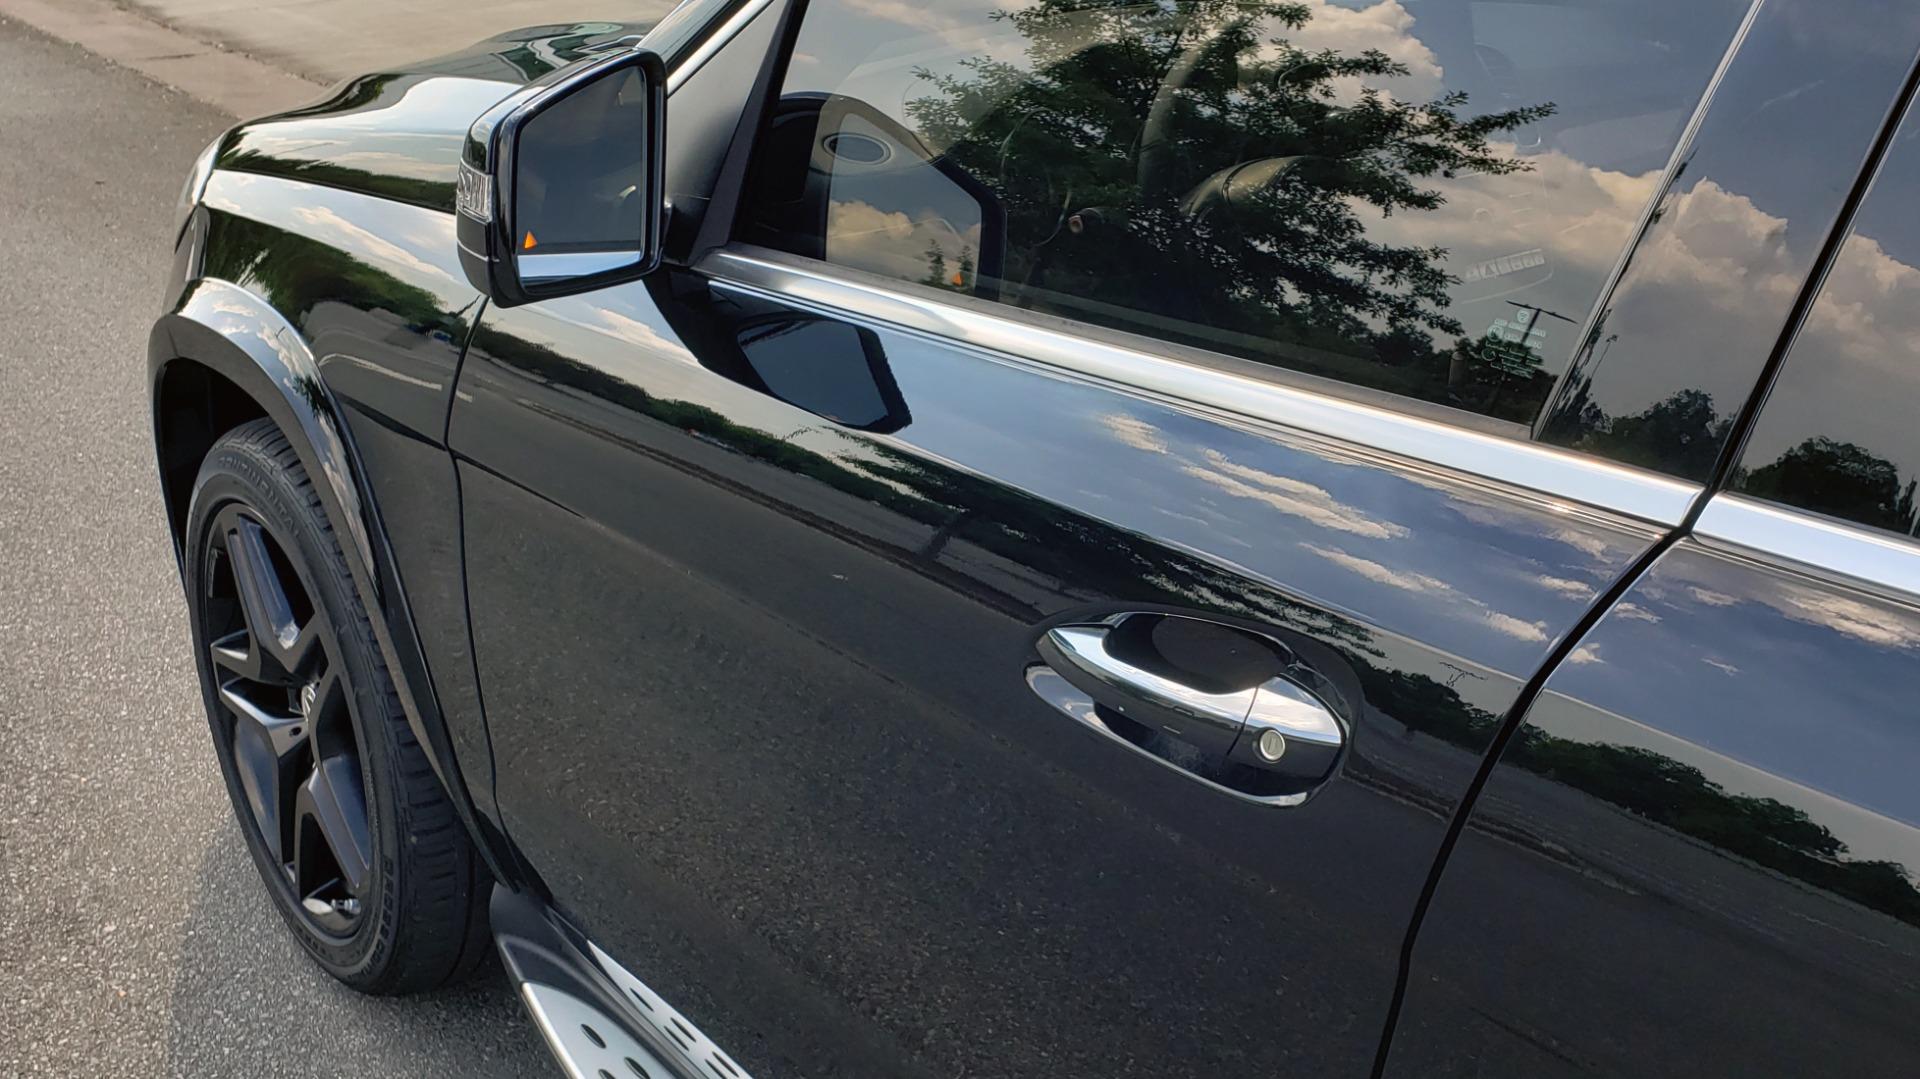 Used 2017 Mercedes-Benz GLS GLS 550 for sale Sold at Formula Imports in Charlotte NC 28227 11